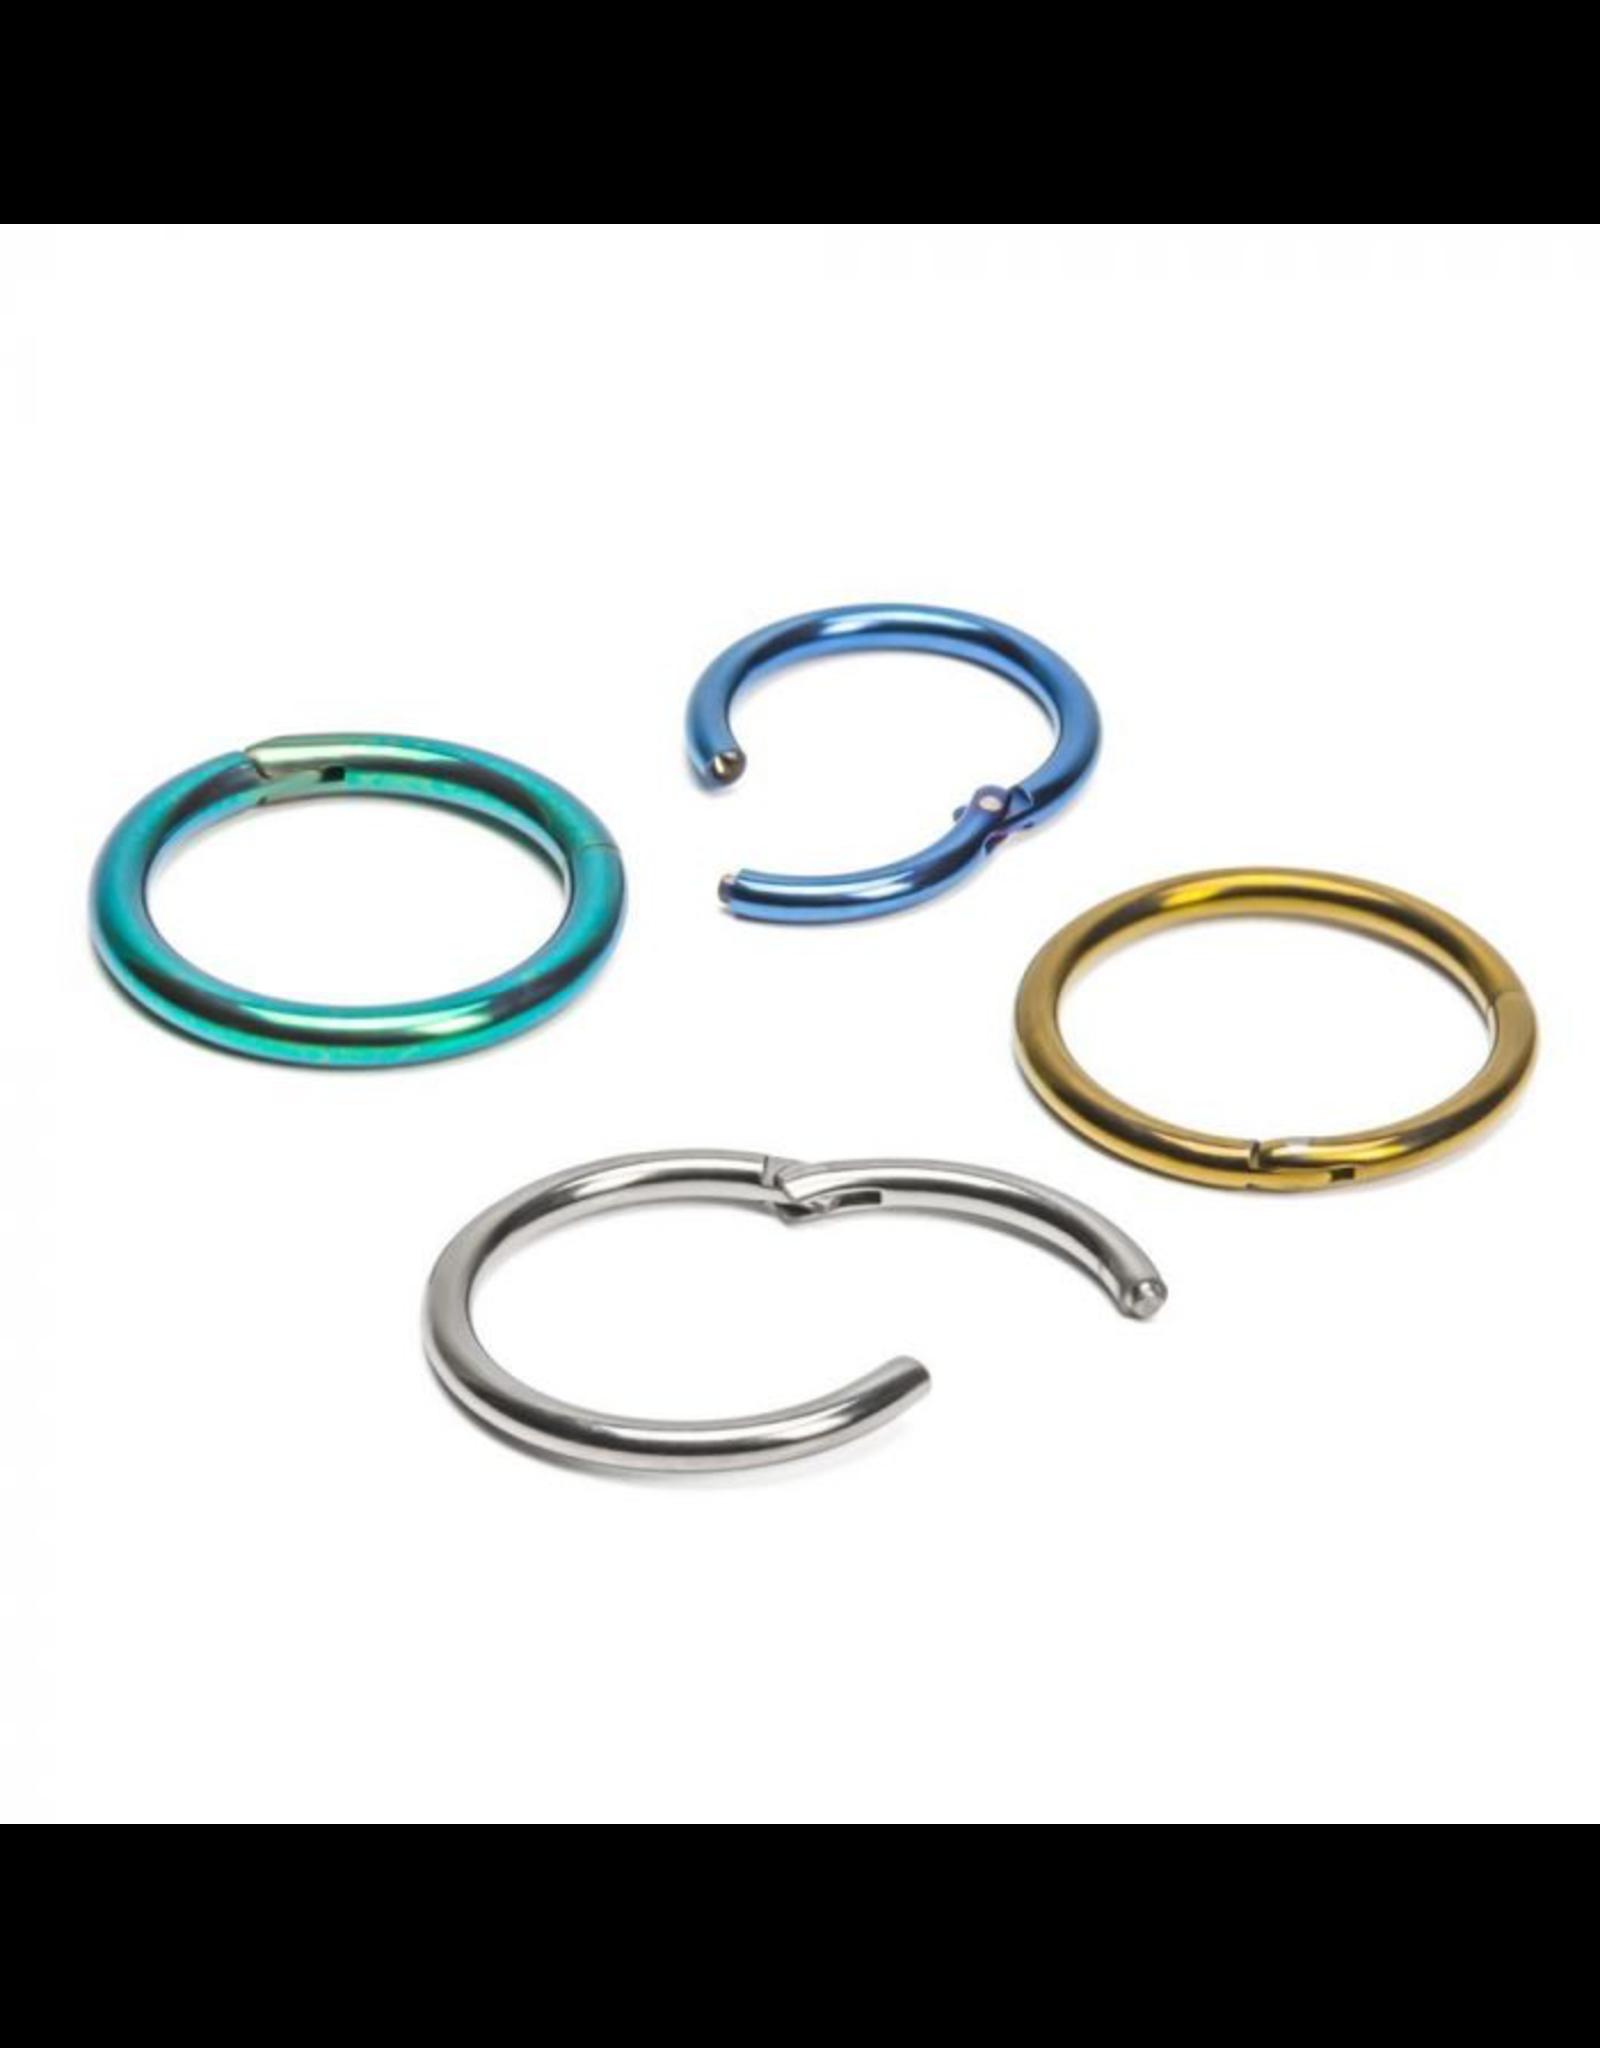 18g Titanium Hinged Rings